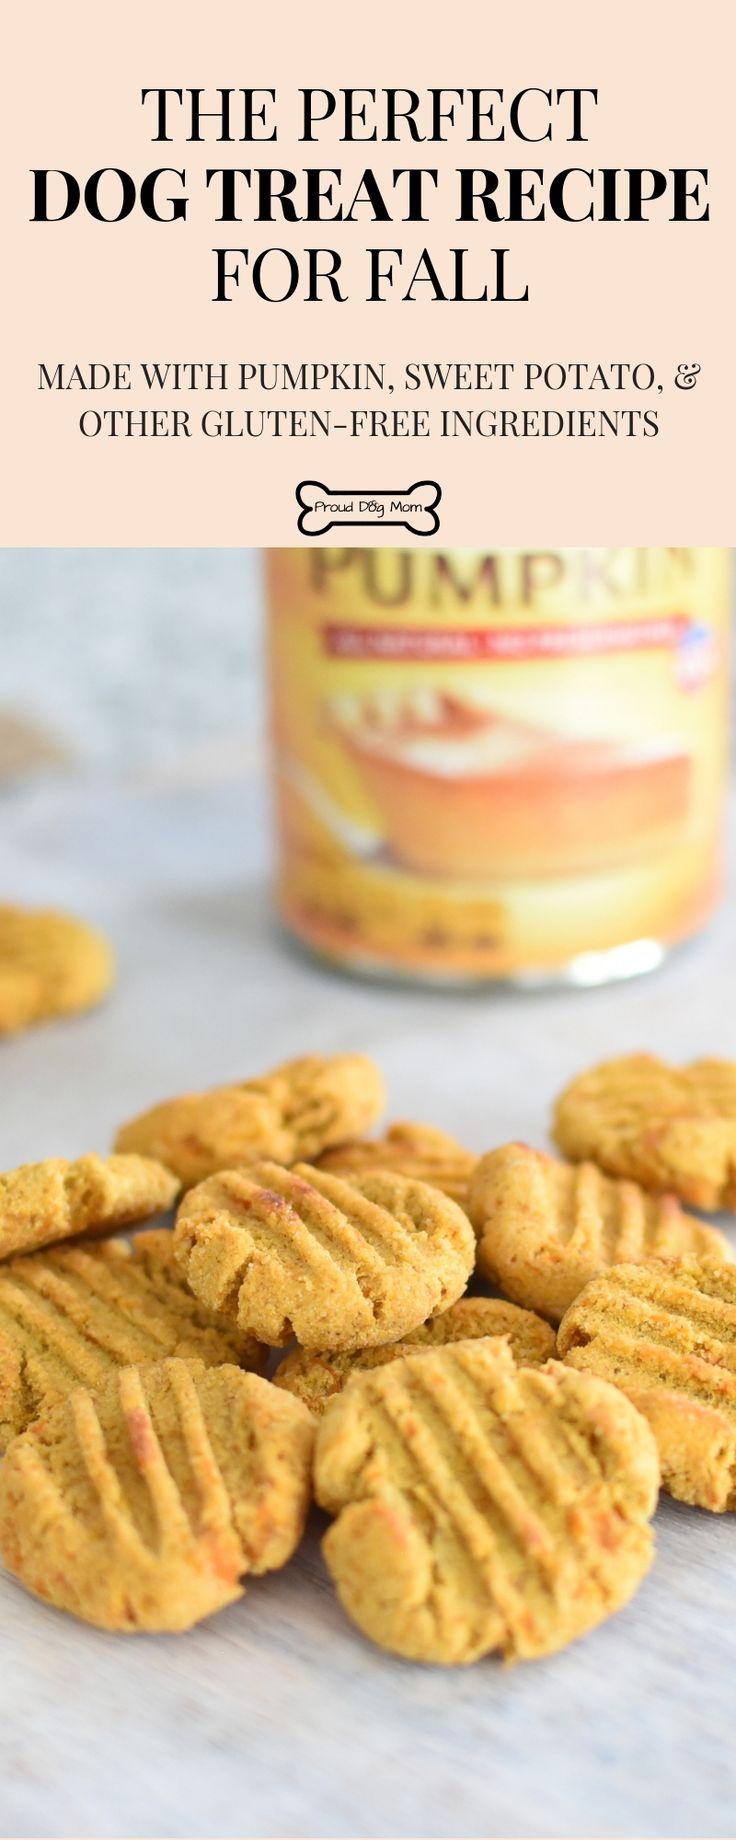 Pumpkin Sweet Potato Bites